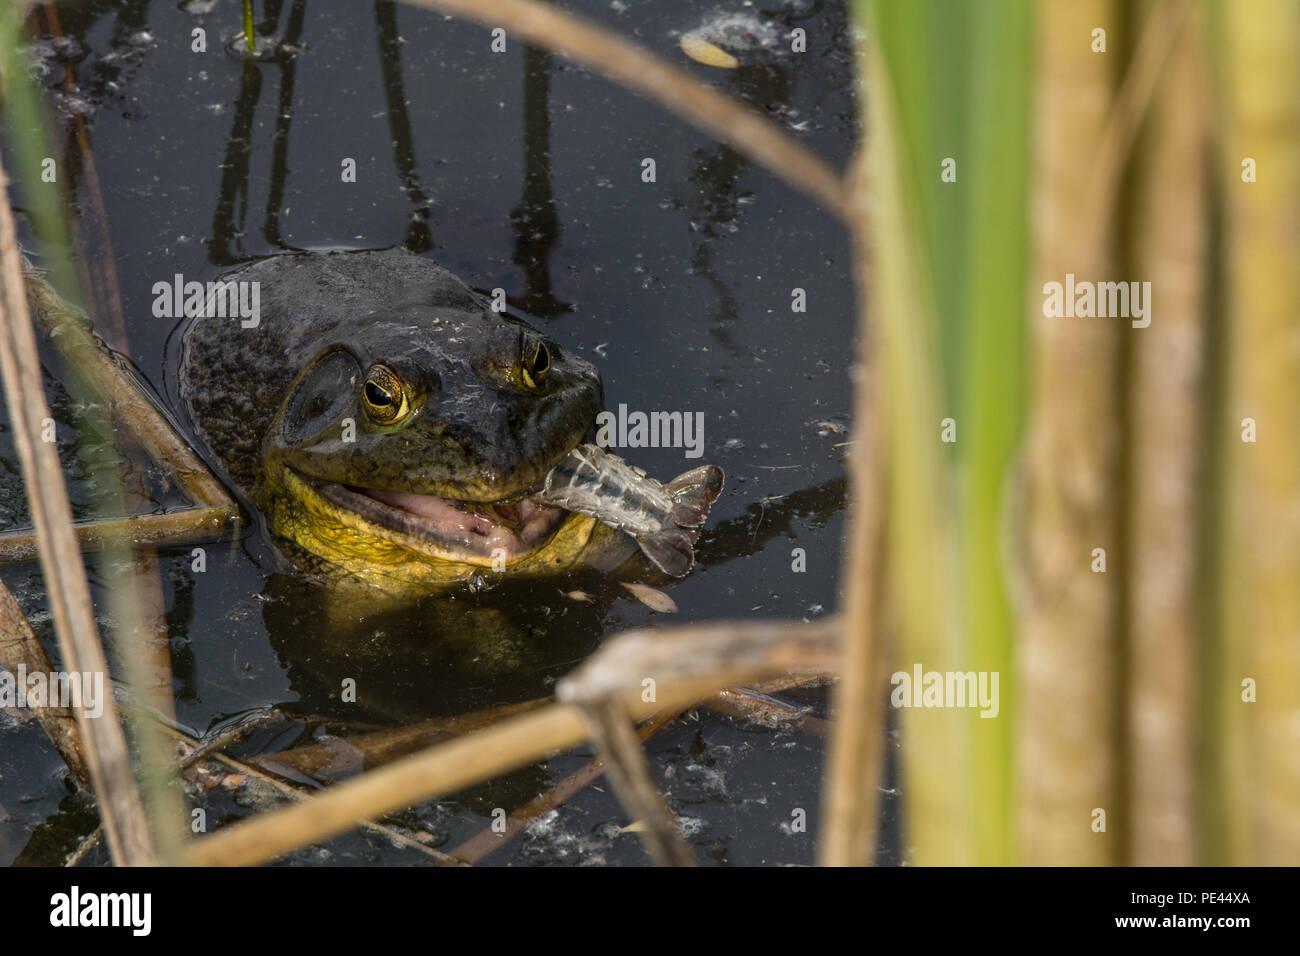 American Bullfrog (Lithobates catesbeianus) from Socorro County, New Mexico, USA. Stock Photo